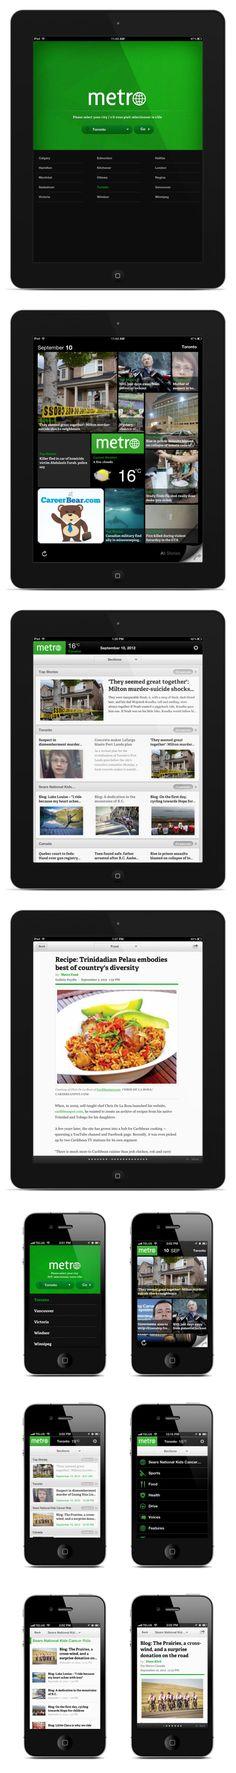 Metro News - iOS & Android App by Anna Karatcheva, via Behance